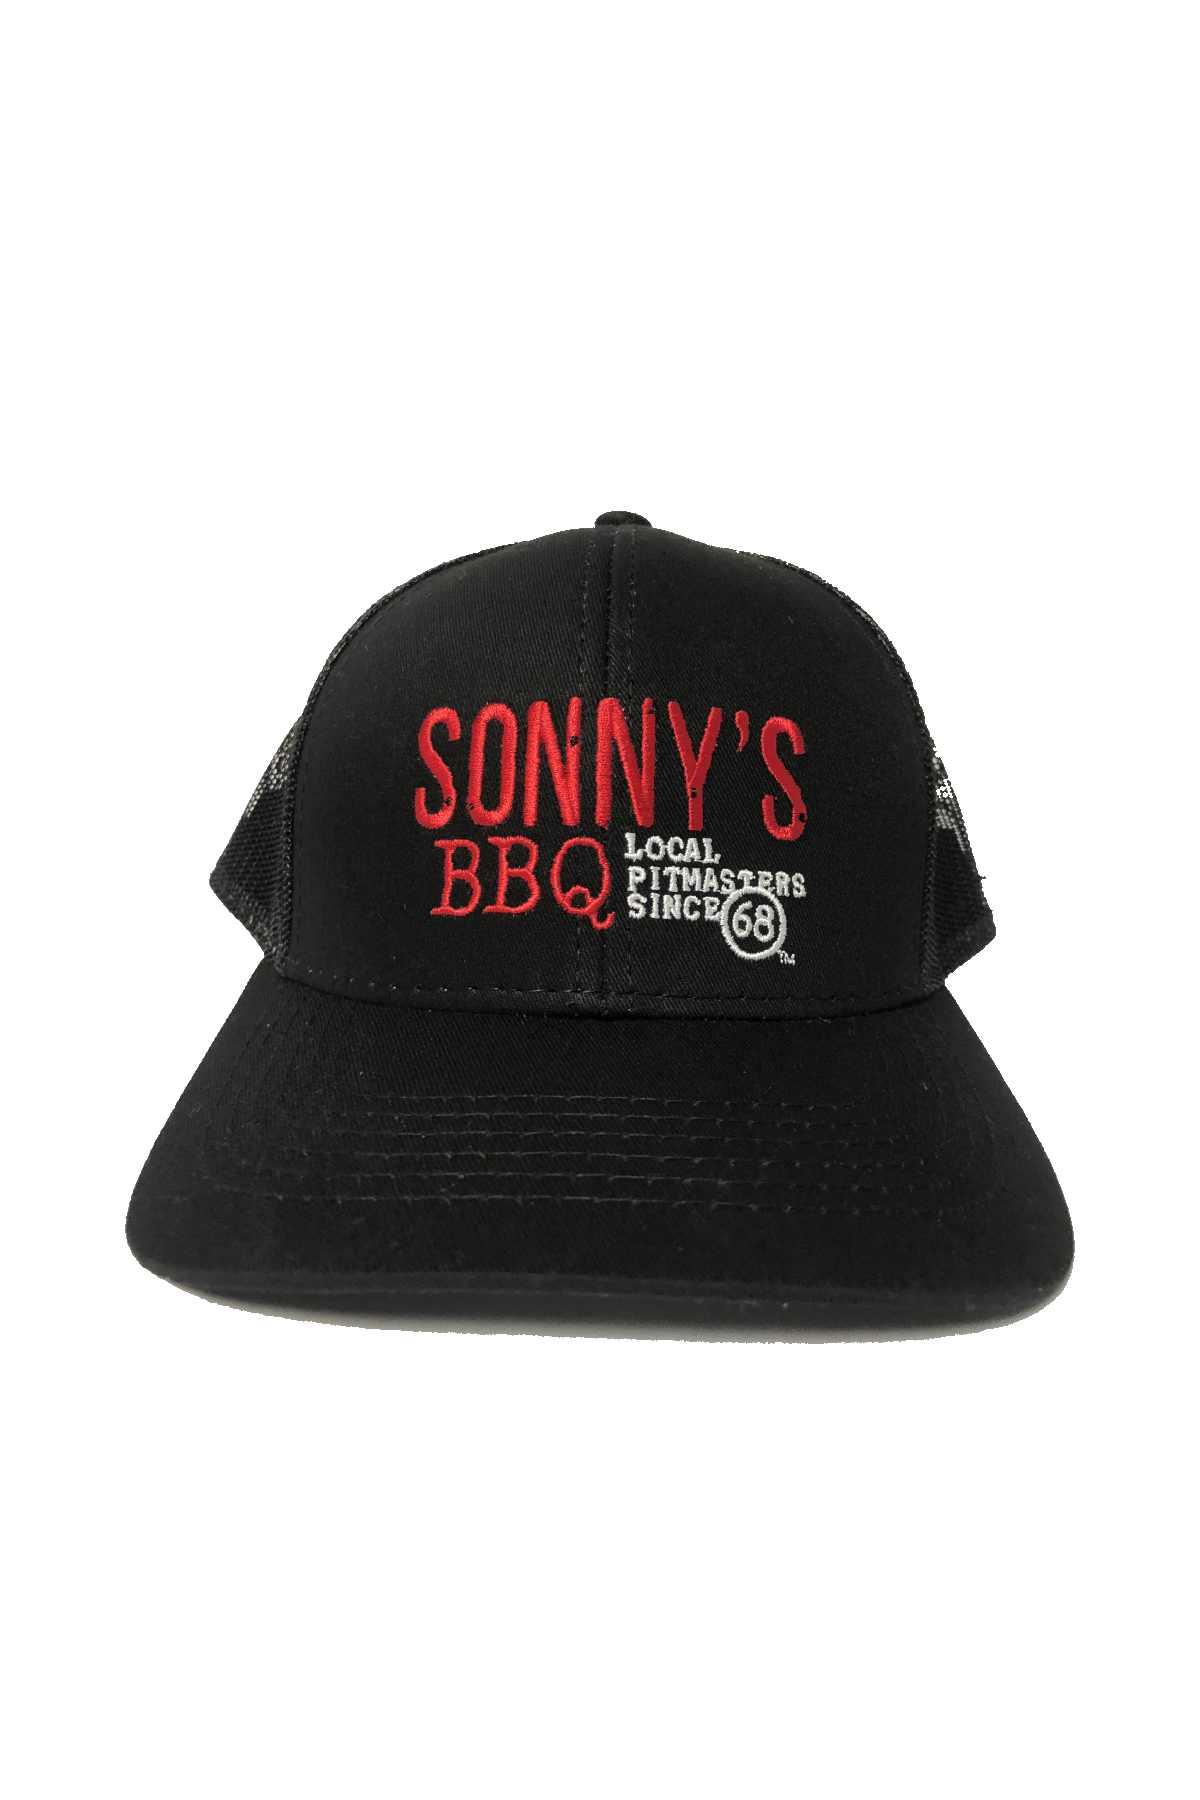 Sonny's BBQ – BOH / Cook Hat: Twill / Mesh Trucker Hat.  MBW-800C – Black – OSFM